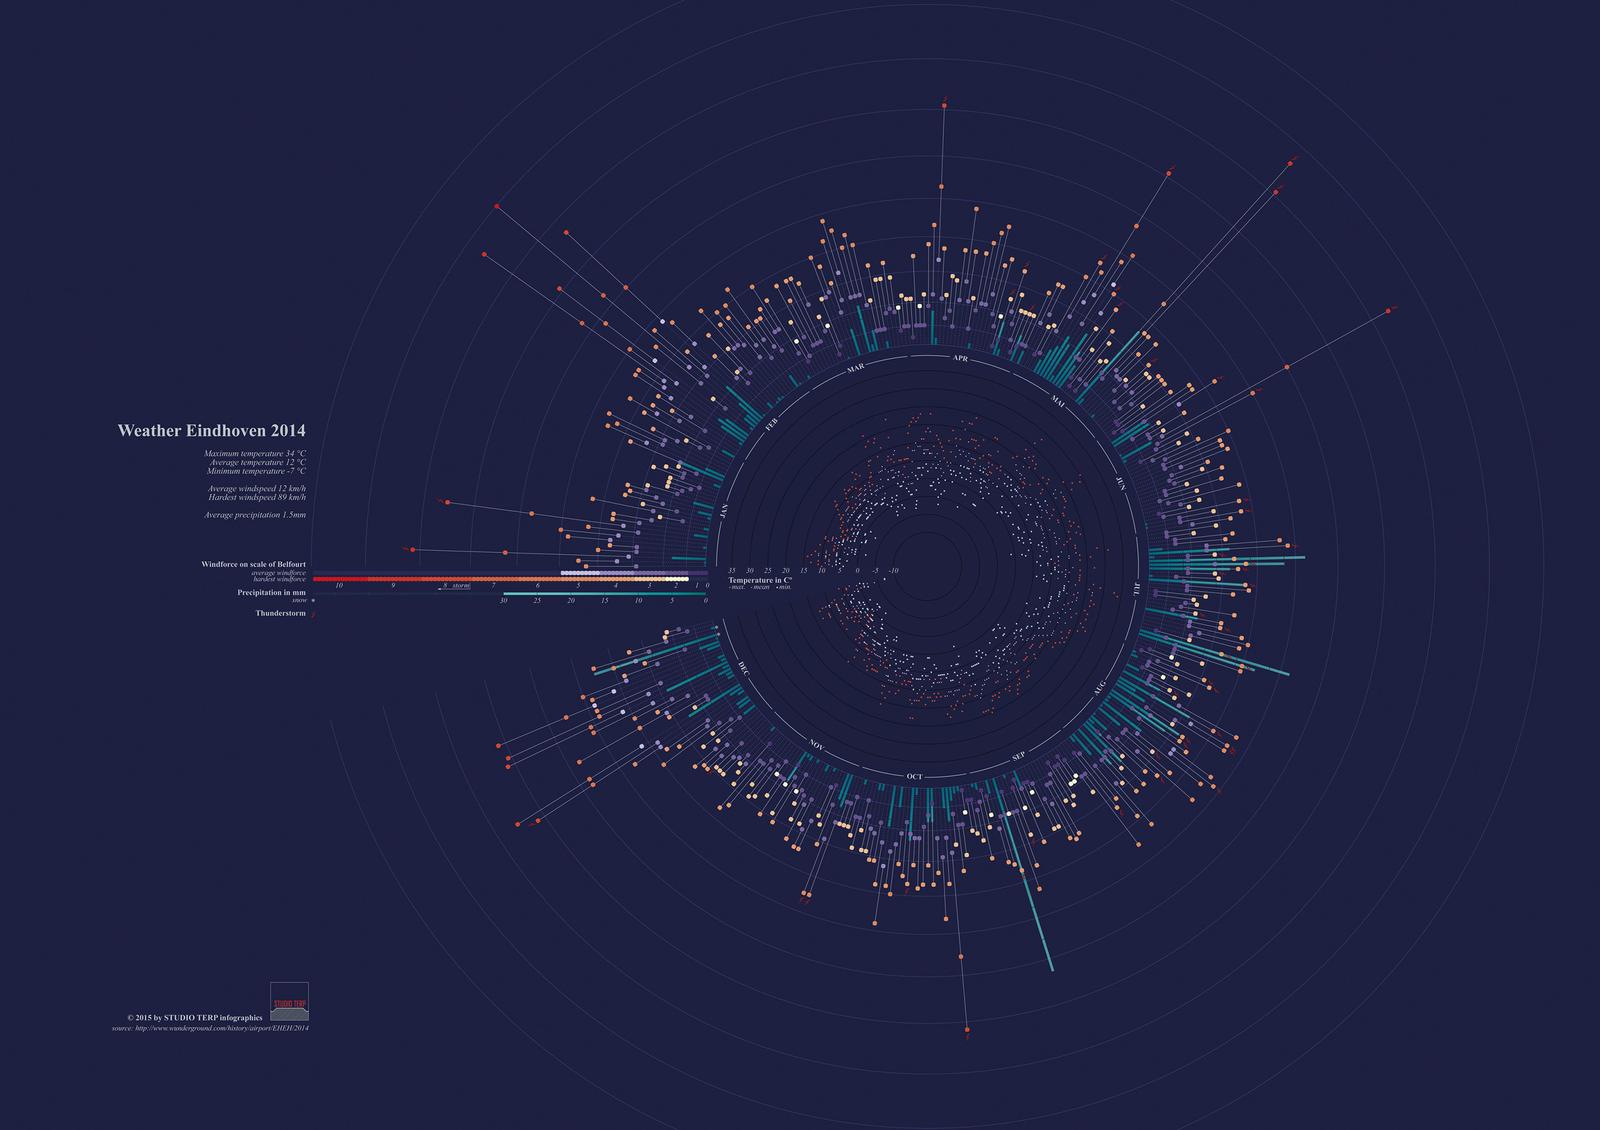 Weather Einhoven 2014 - data visualization example